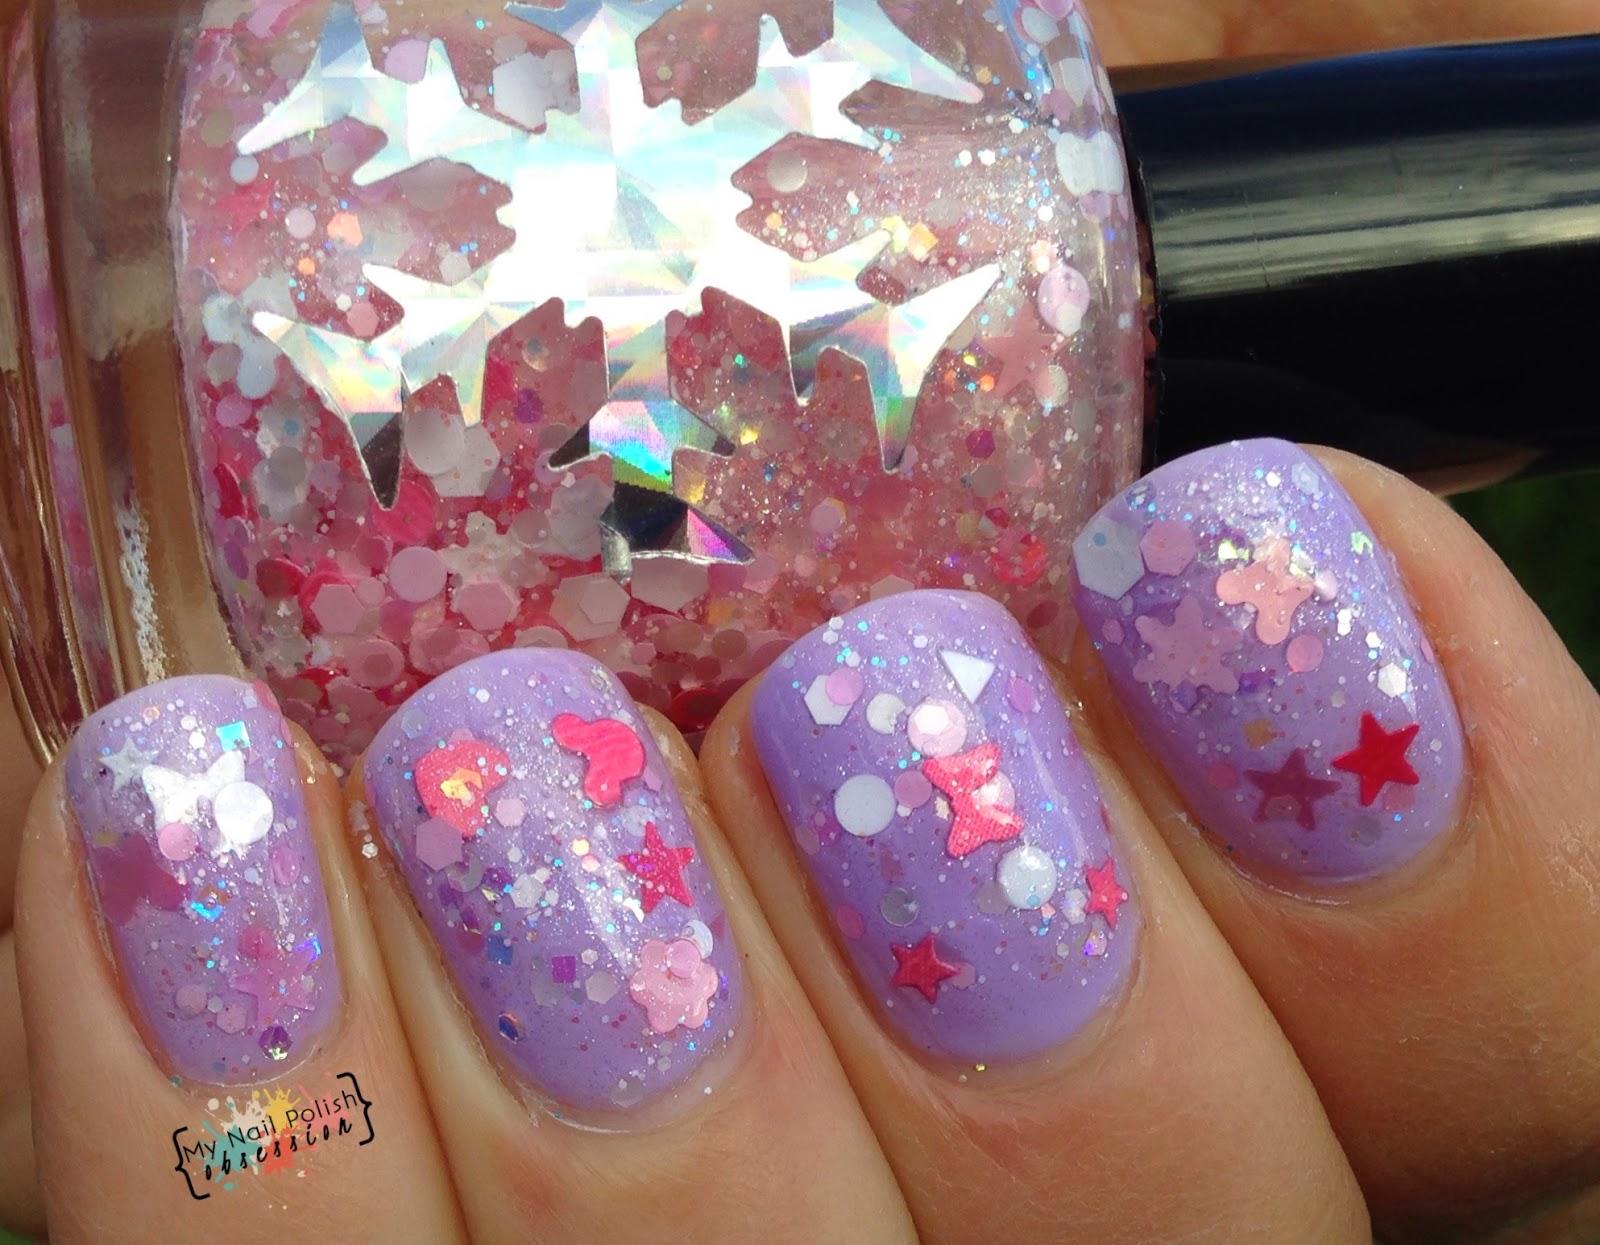 Lumina Lacquer Merry Pinkmas